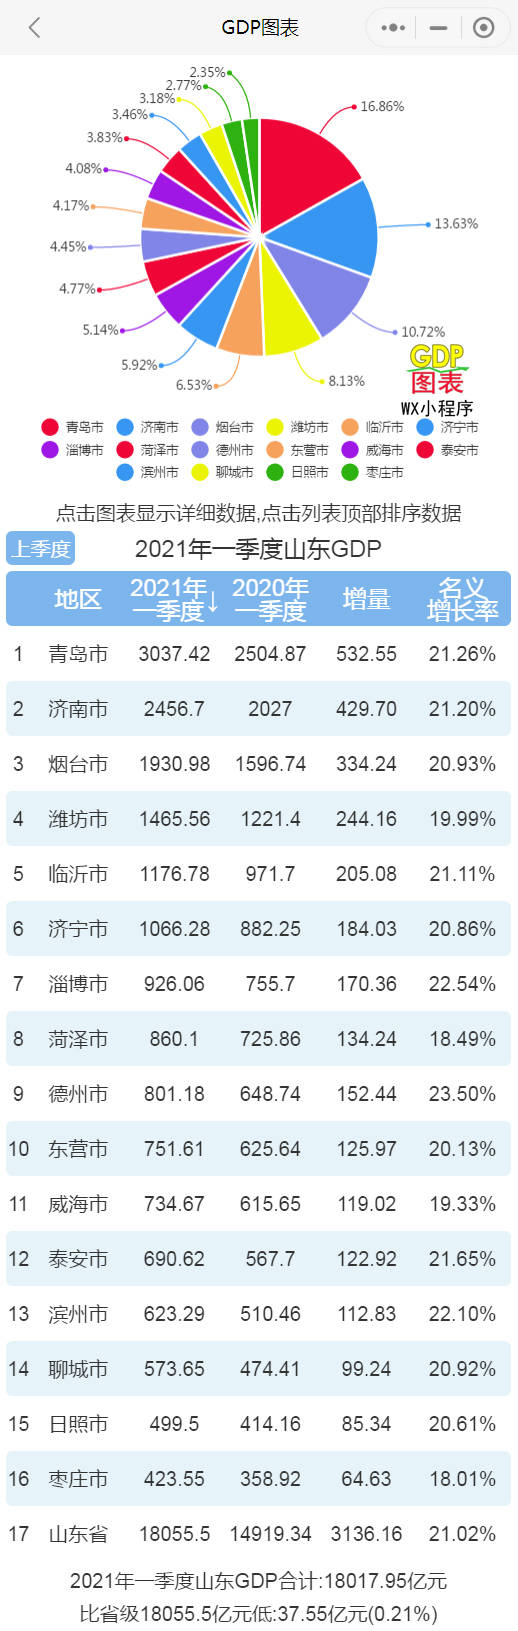 gdp排名2021世界排名_2021一季度城市GDP前10强公布:这个城市竟超过苏州排名第5!